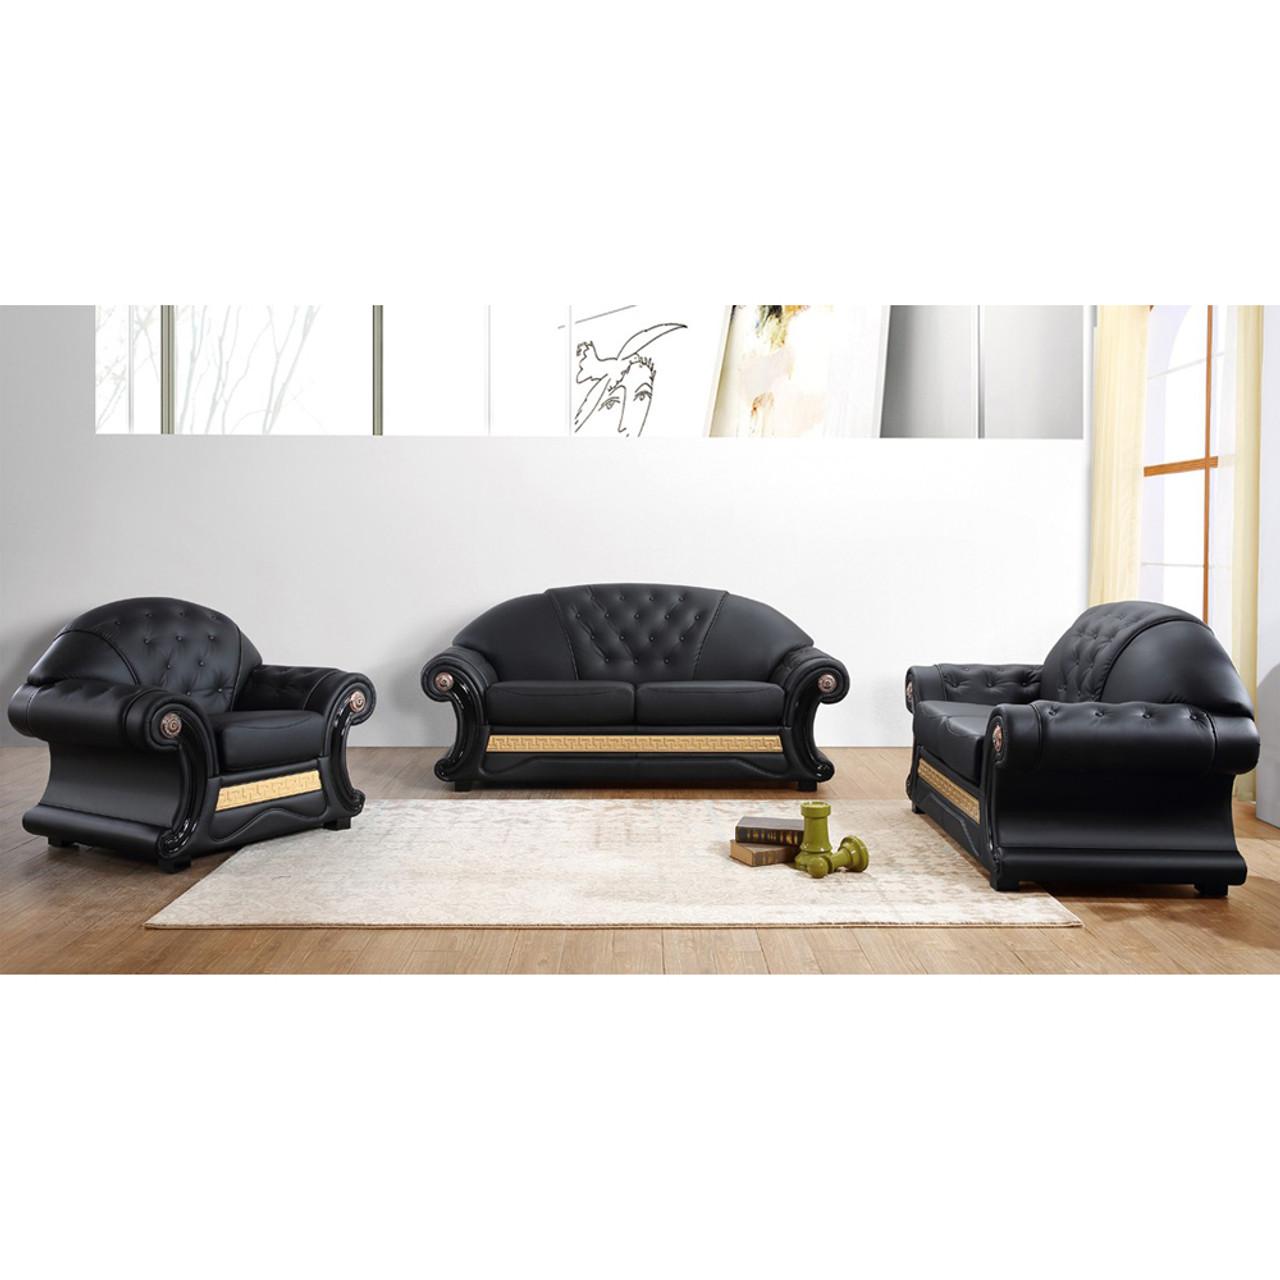 Divani Casa Cleopatra Traditional Black Leather Sofa Set - Lounge LA